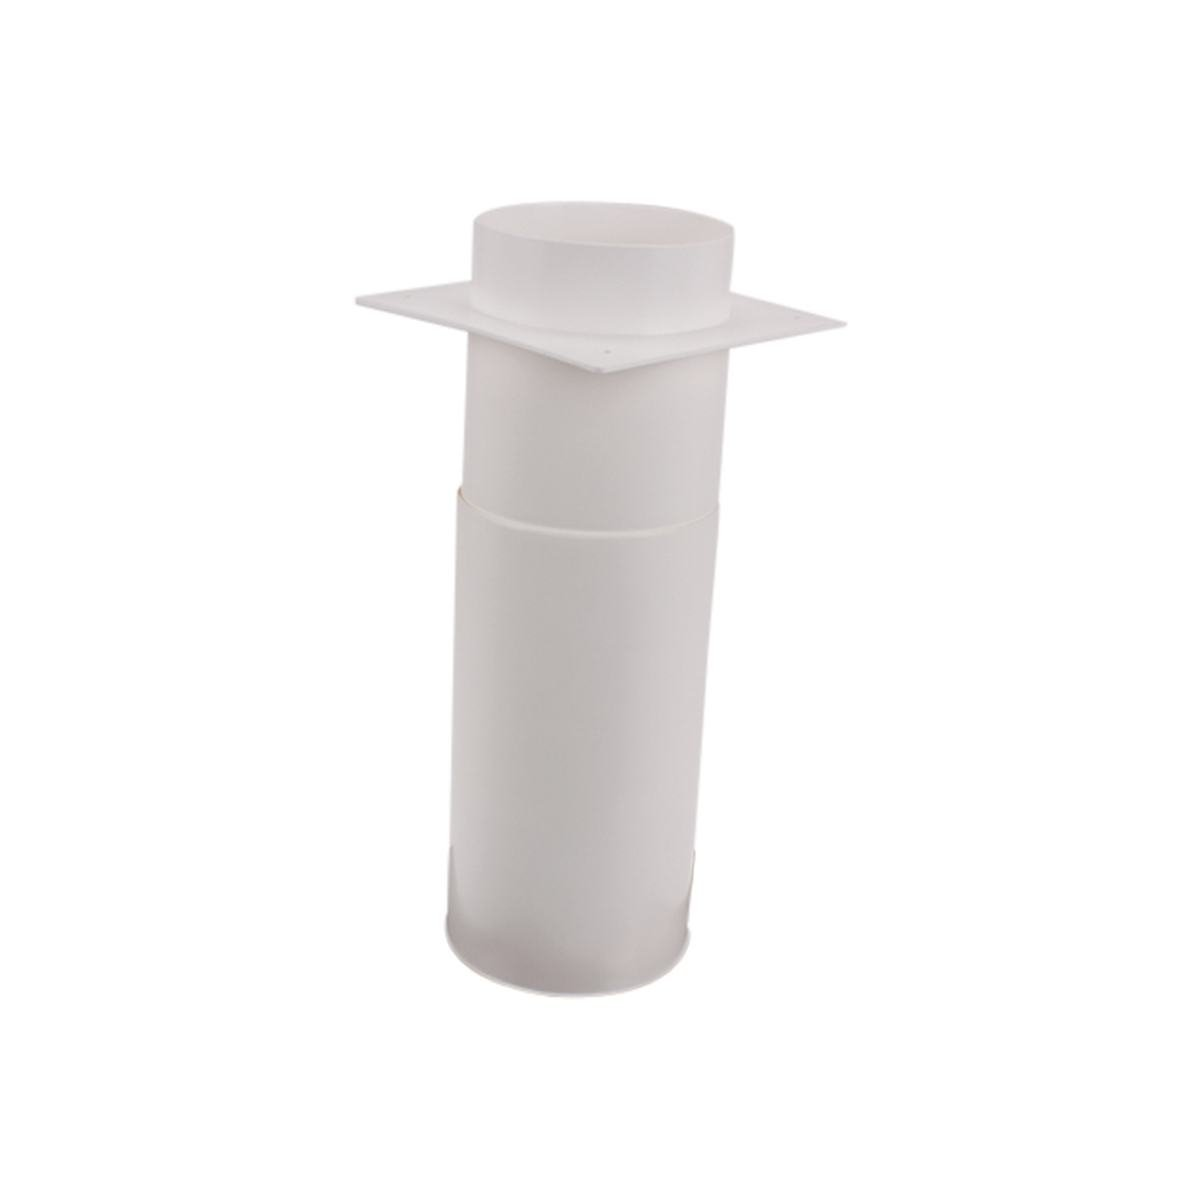 Murgennemføring med faste lameller Ø125 mm. rustfr